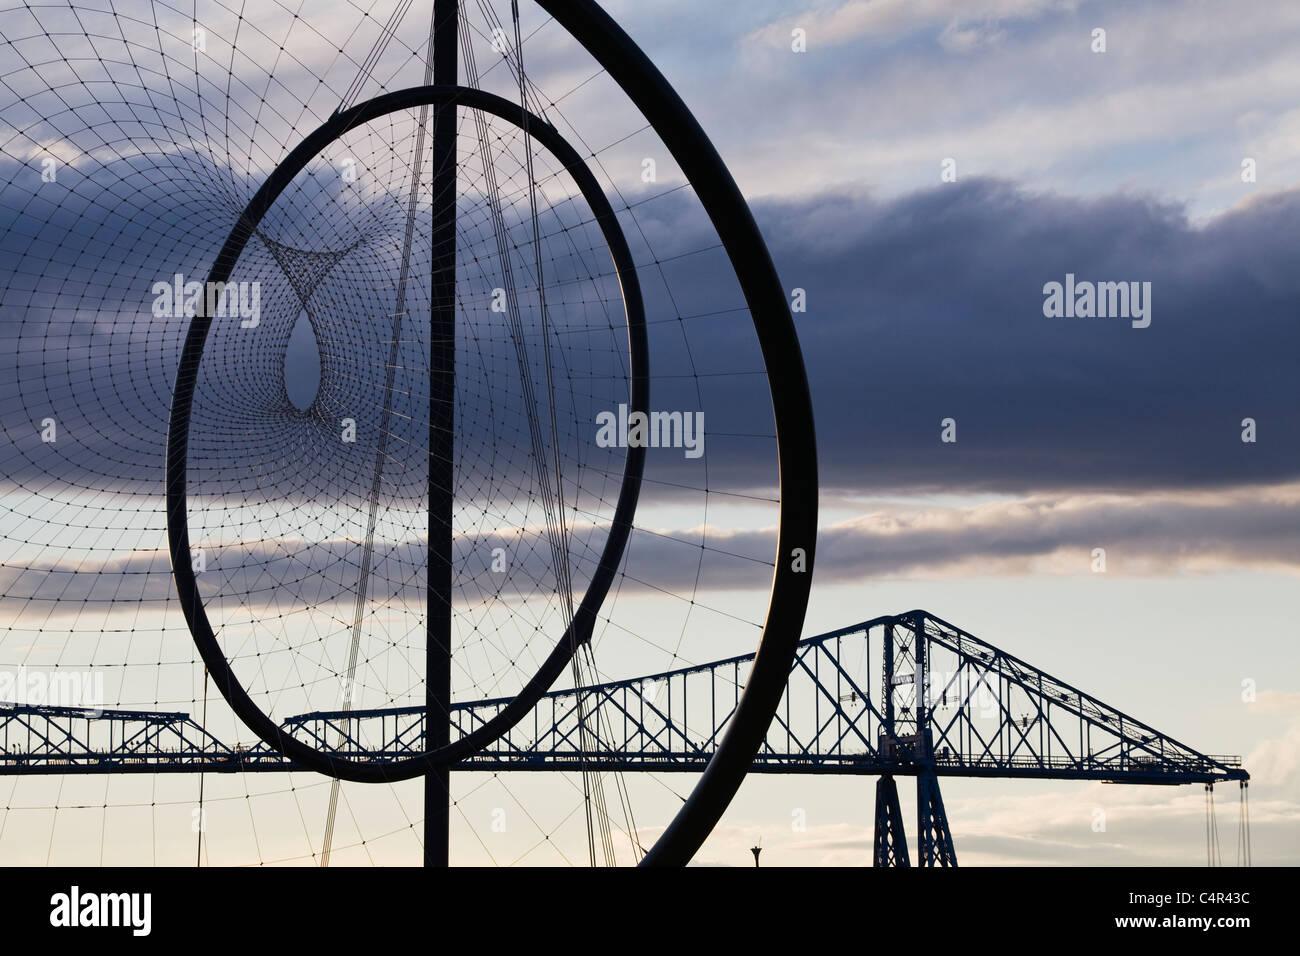 Temenos Sculpture (Kapoor) with Transporter Bridge, Middlesborough, England - Stock Image